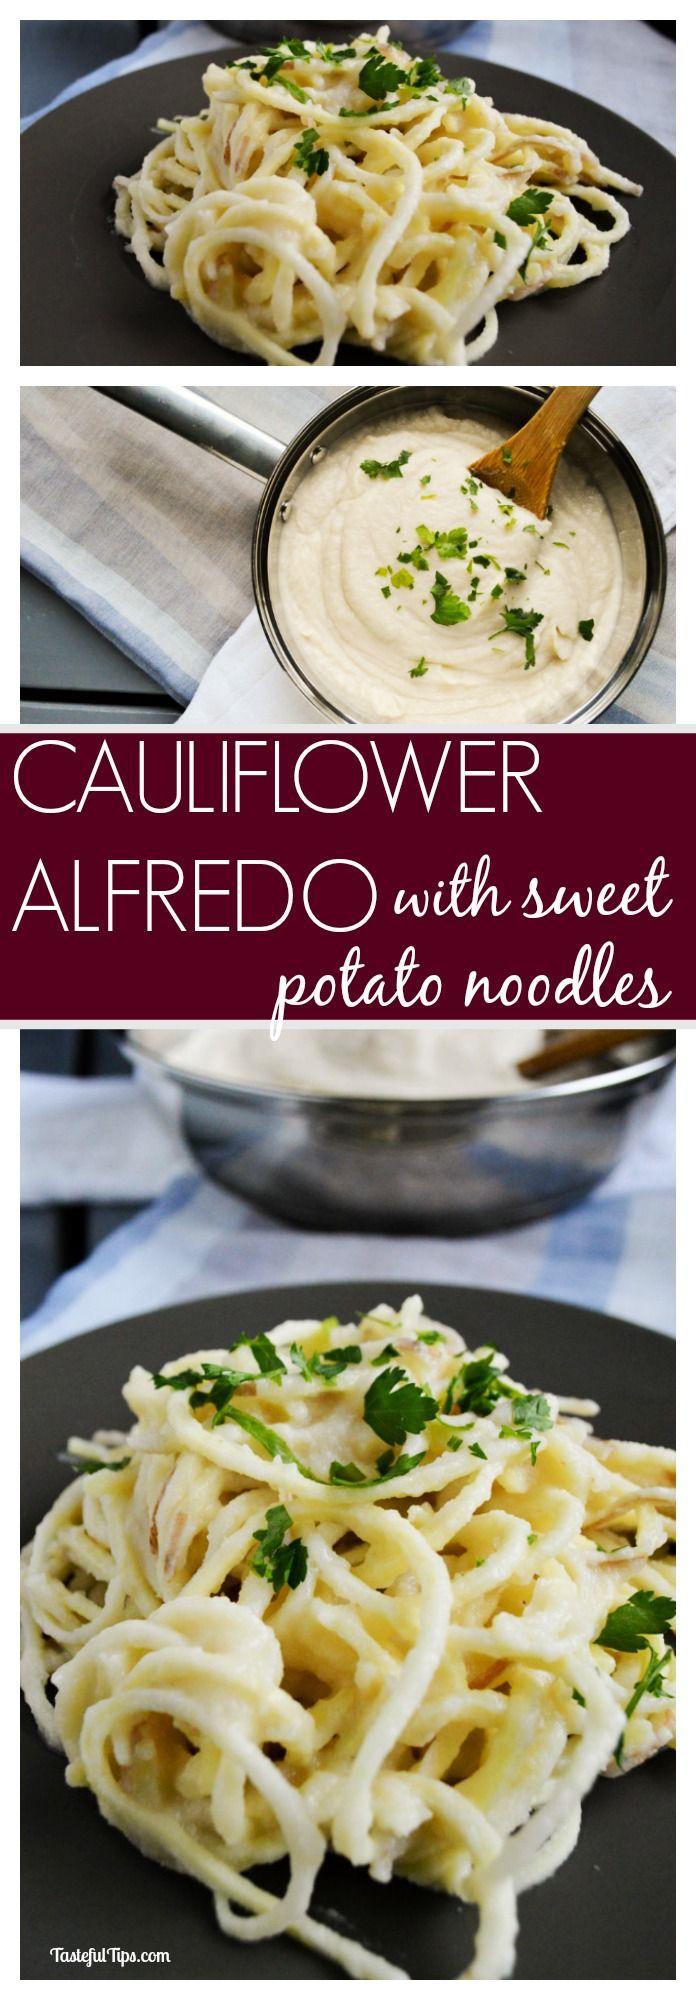 Garlic Cauliflower Alfredo with Sweet Potato Noodles - vegan, dairy free, gluten free, and delicious!